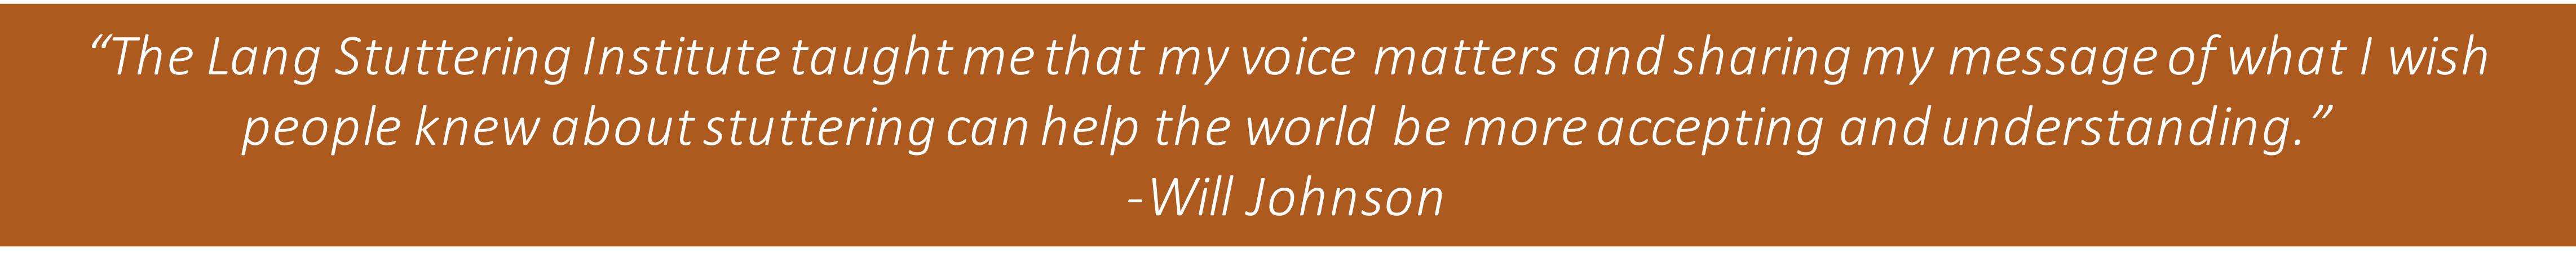 Will Johnson Quote